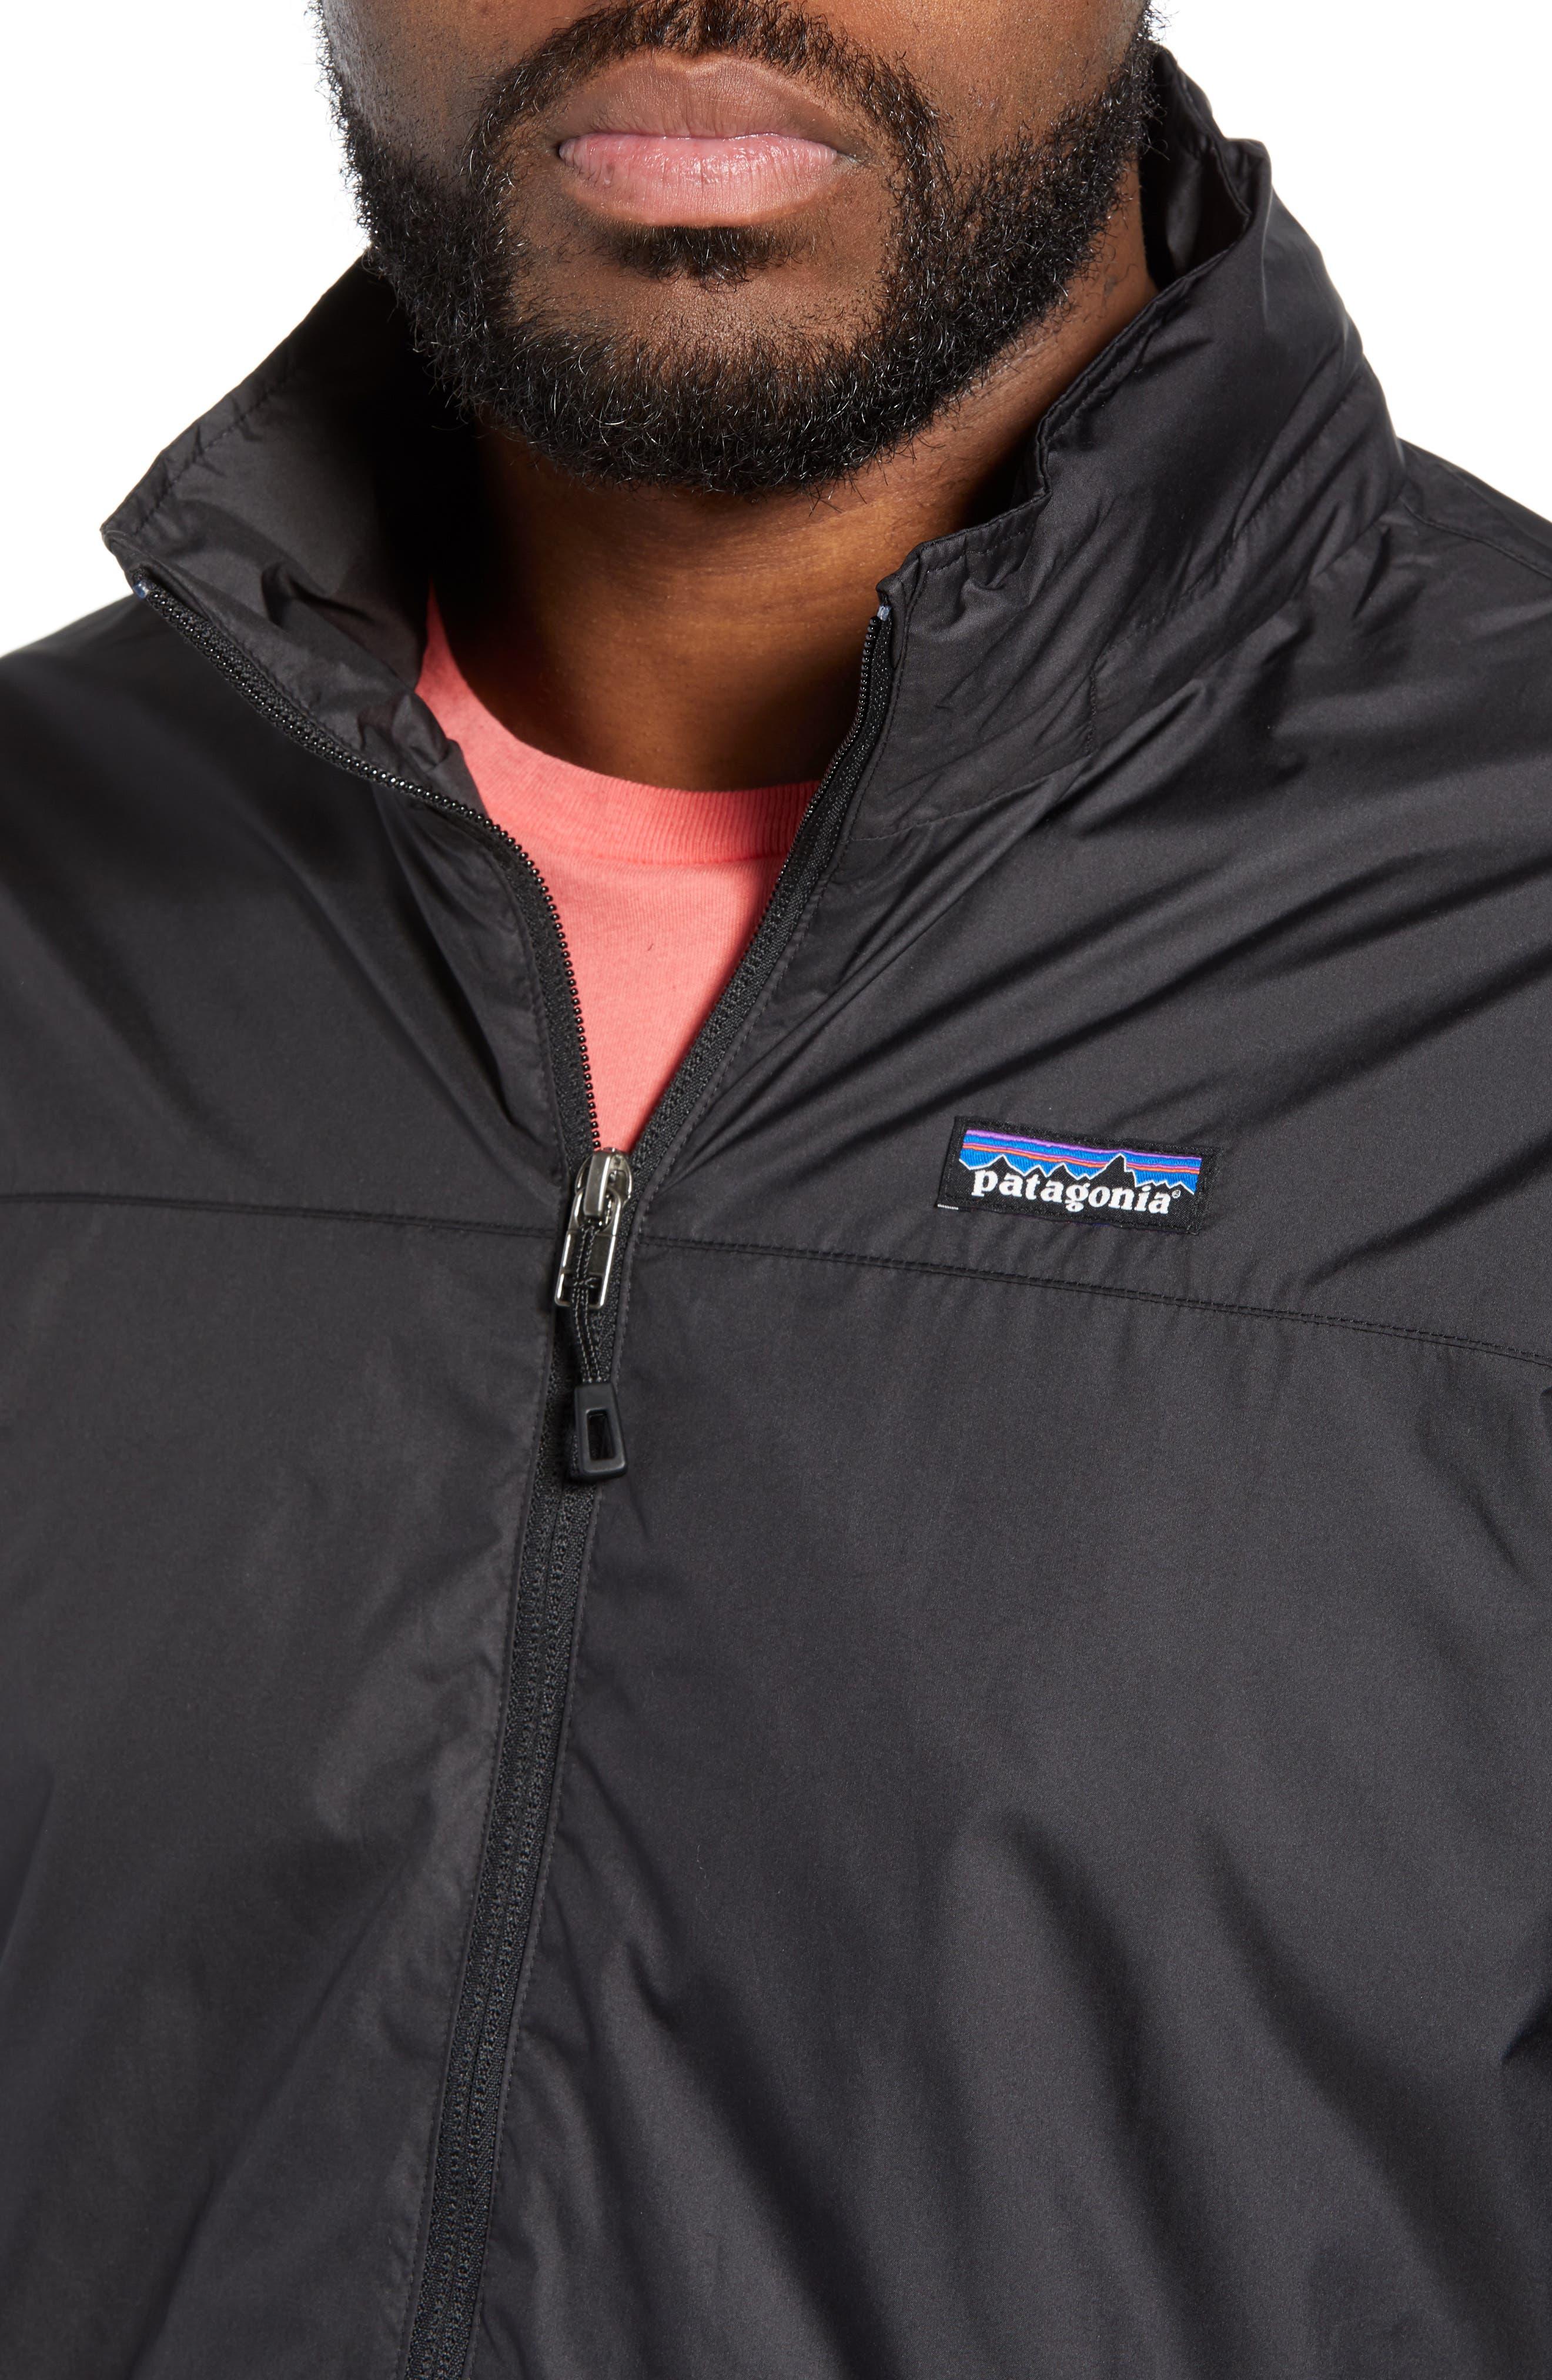 PATAGONIA, Light & Variable<sup>™</sup> Wind & Water Resistant Hooded Jacket, Alternate thumbnail 5, color, INK BLACK